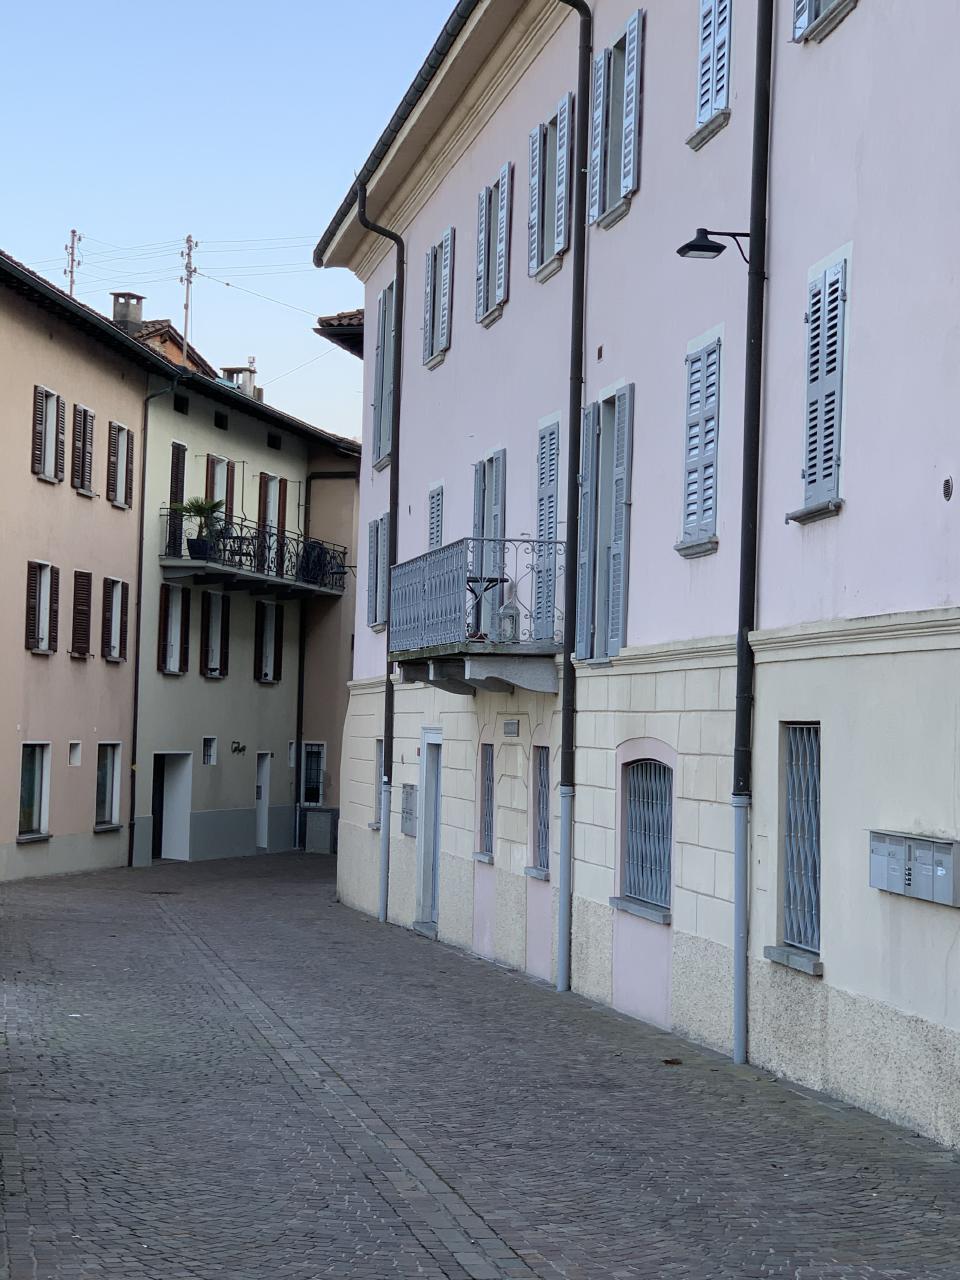 Ferienwohnung 2.5 Zi-Dachwohnung *Il rustico* mit viel Charme (2704083), Caslano, Lago di Lugano (CH), Tessin, Schweiz, Bild 9